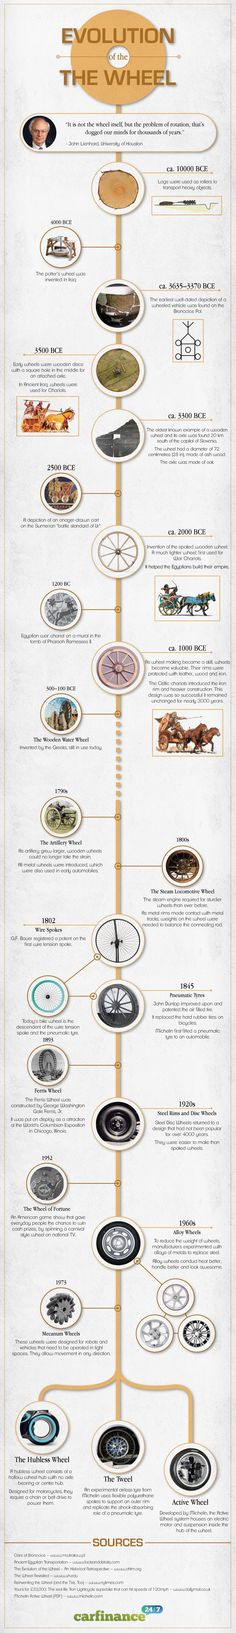 La evolución de la rueda #infografia #infographic